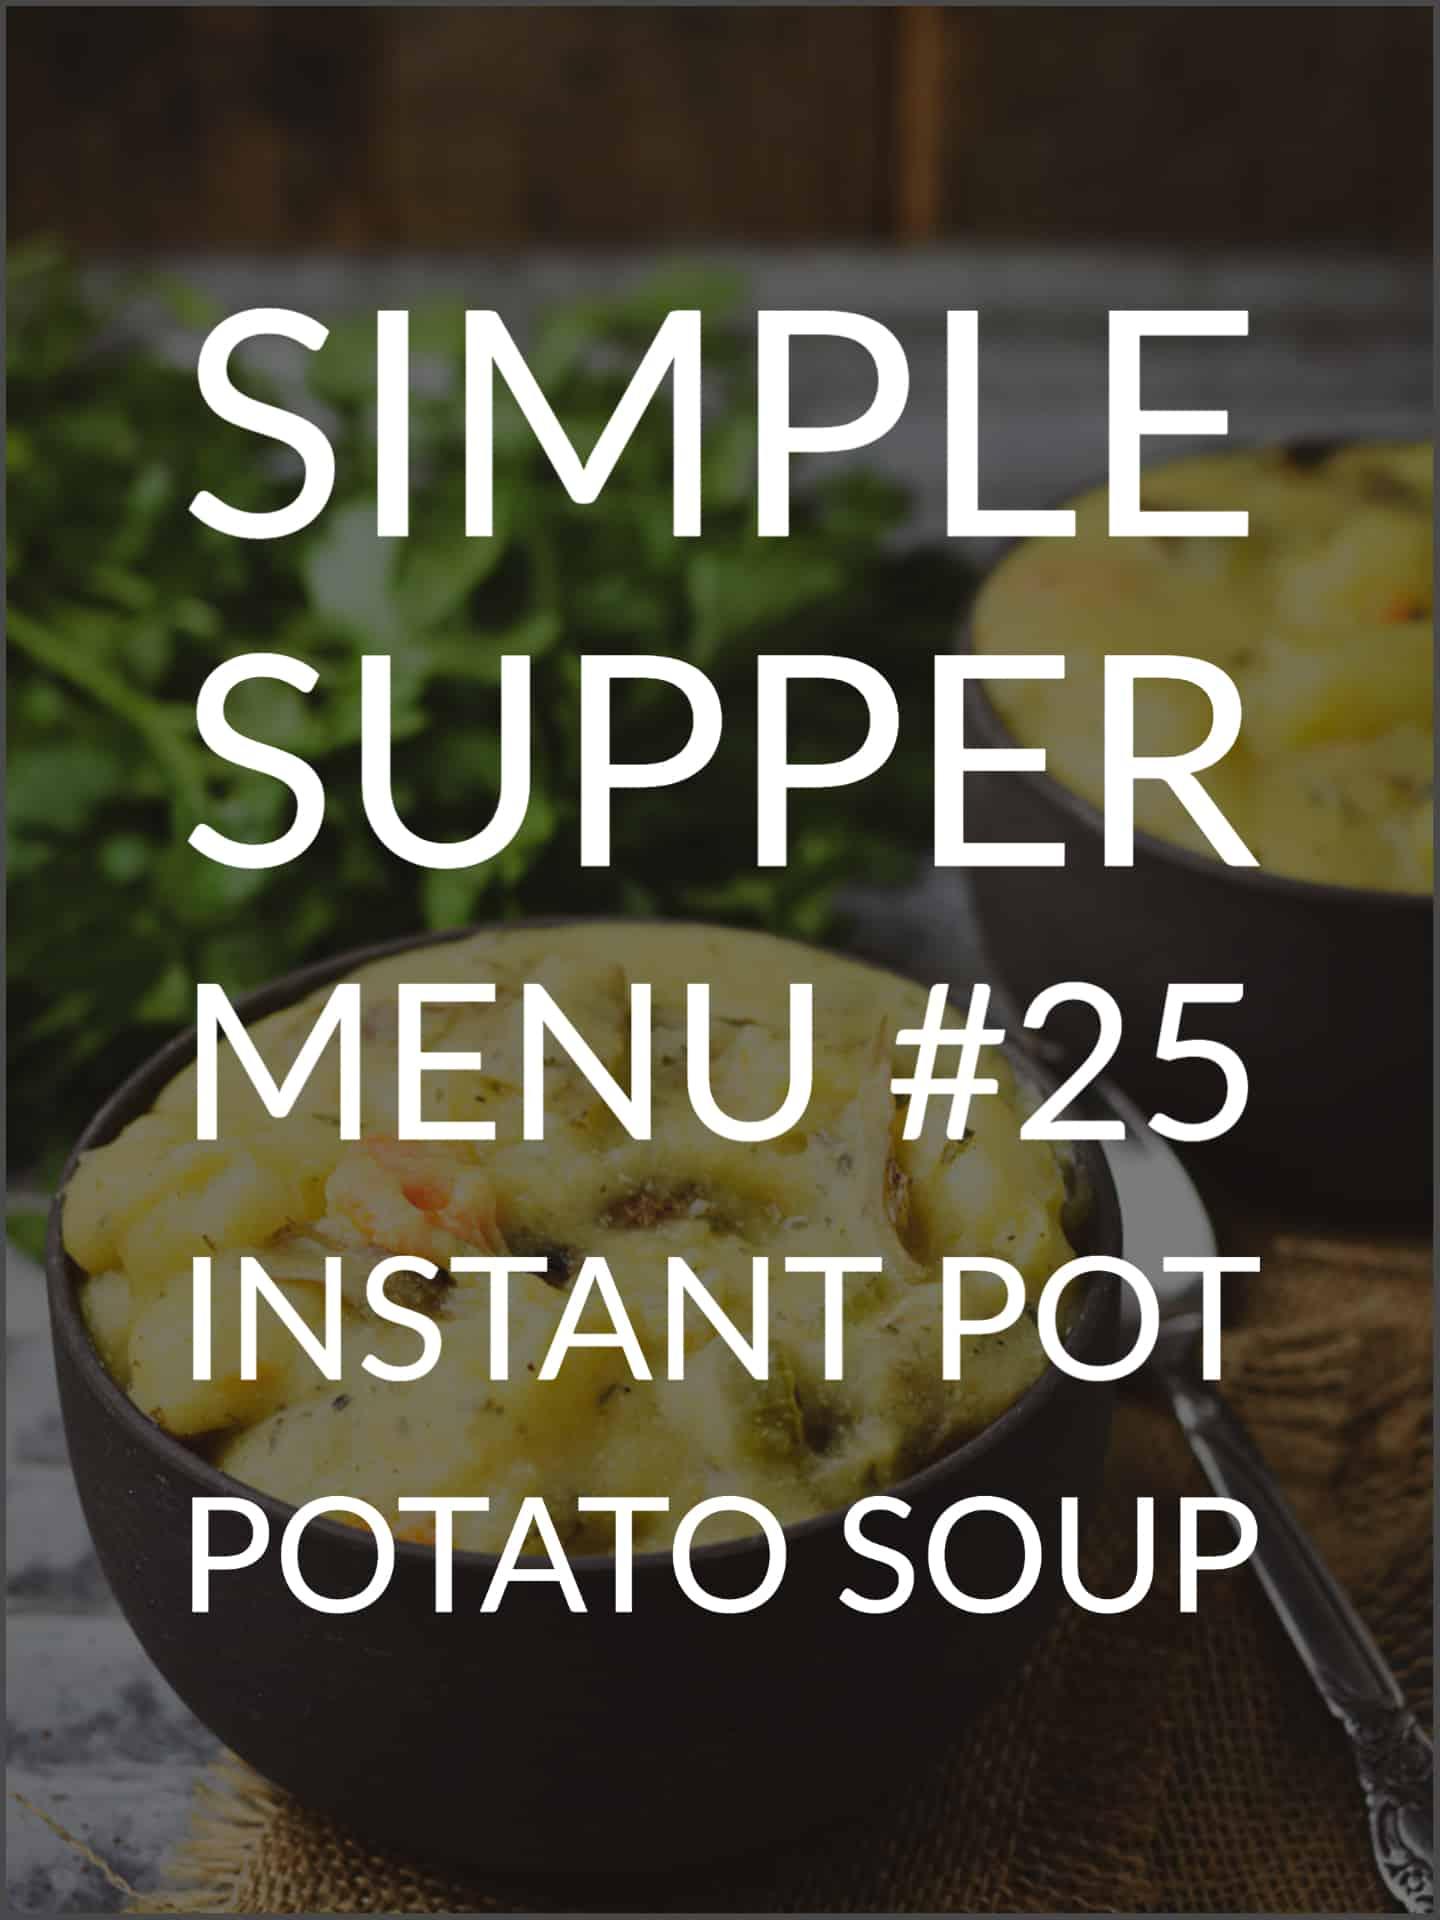 Bowl of potato soup.